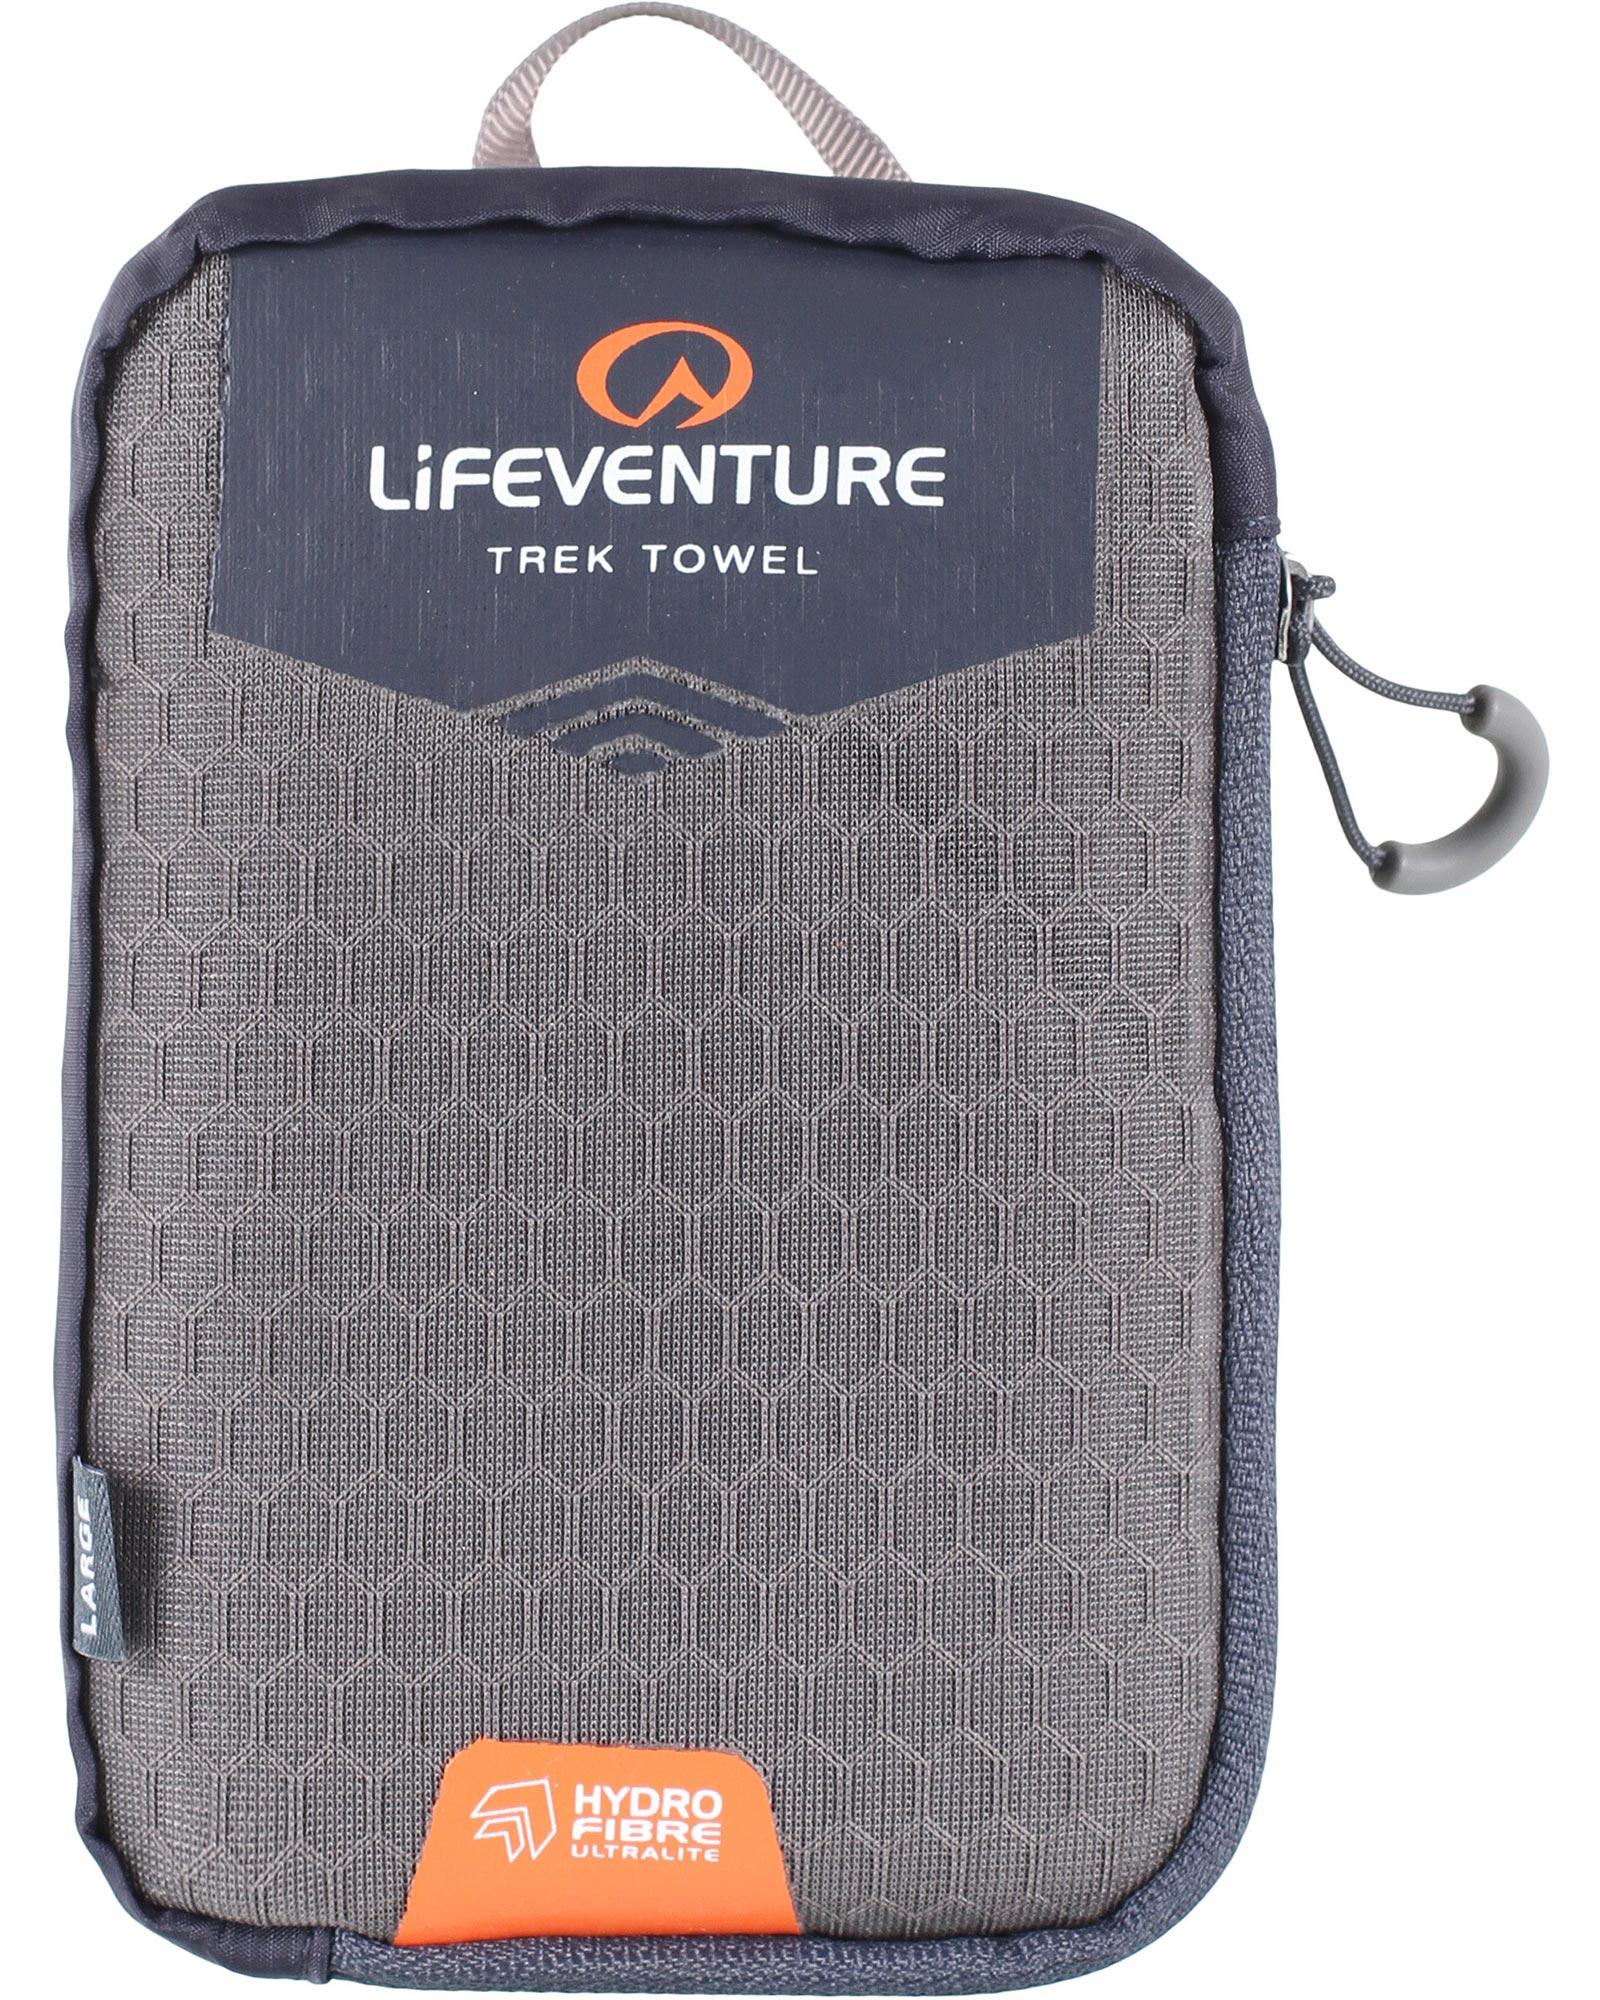 Product image of Lifeventure HydroFibre Trek Towel - Large